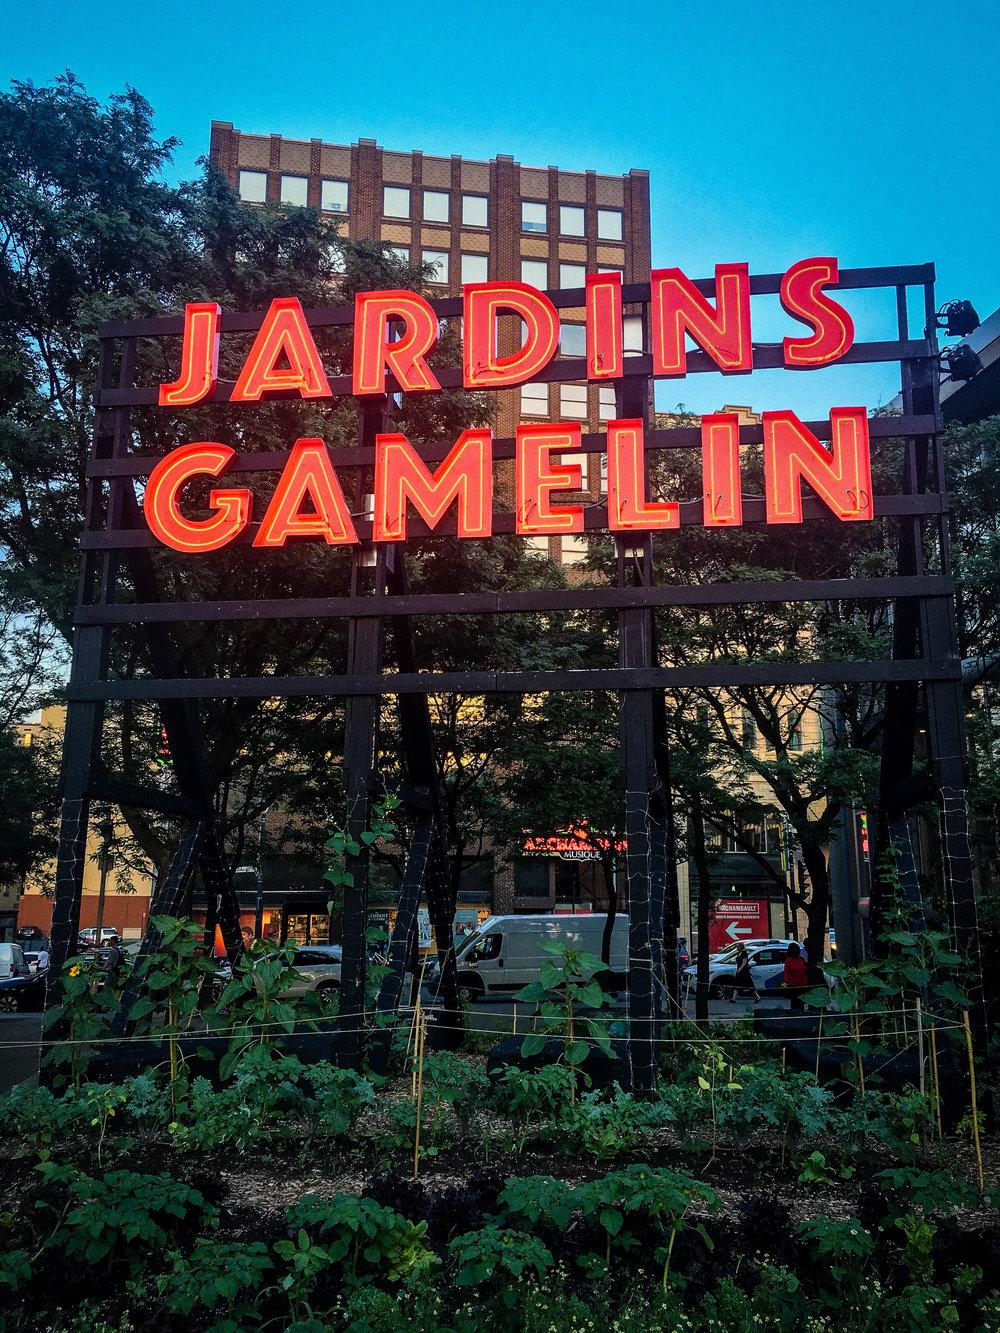 Jardins Gamelin garden, one of the 6 original terraces to enjoy the summer in Montreal